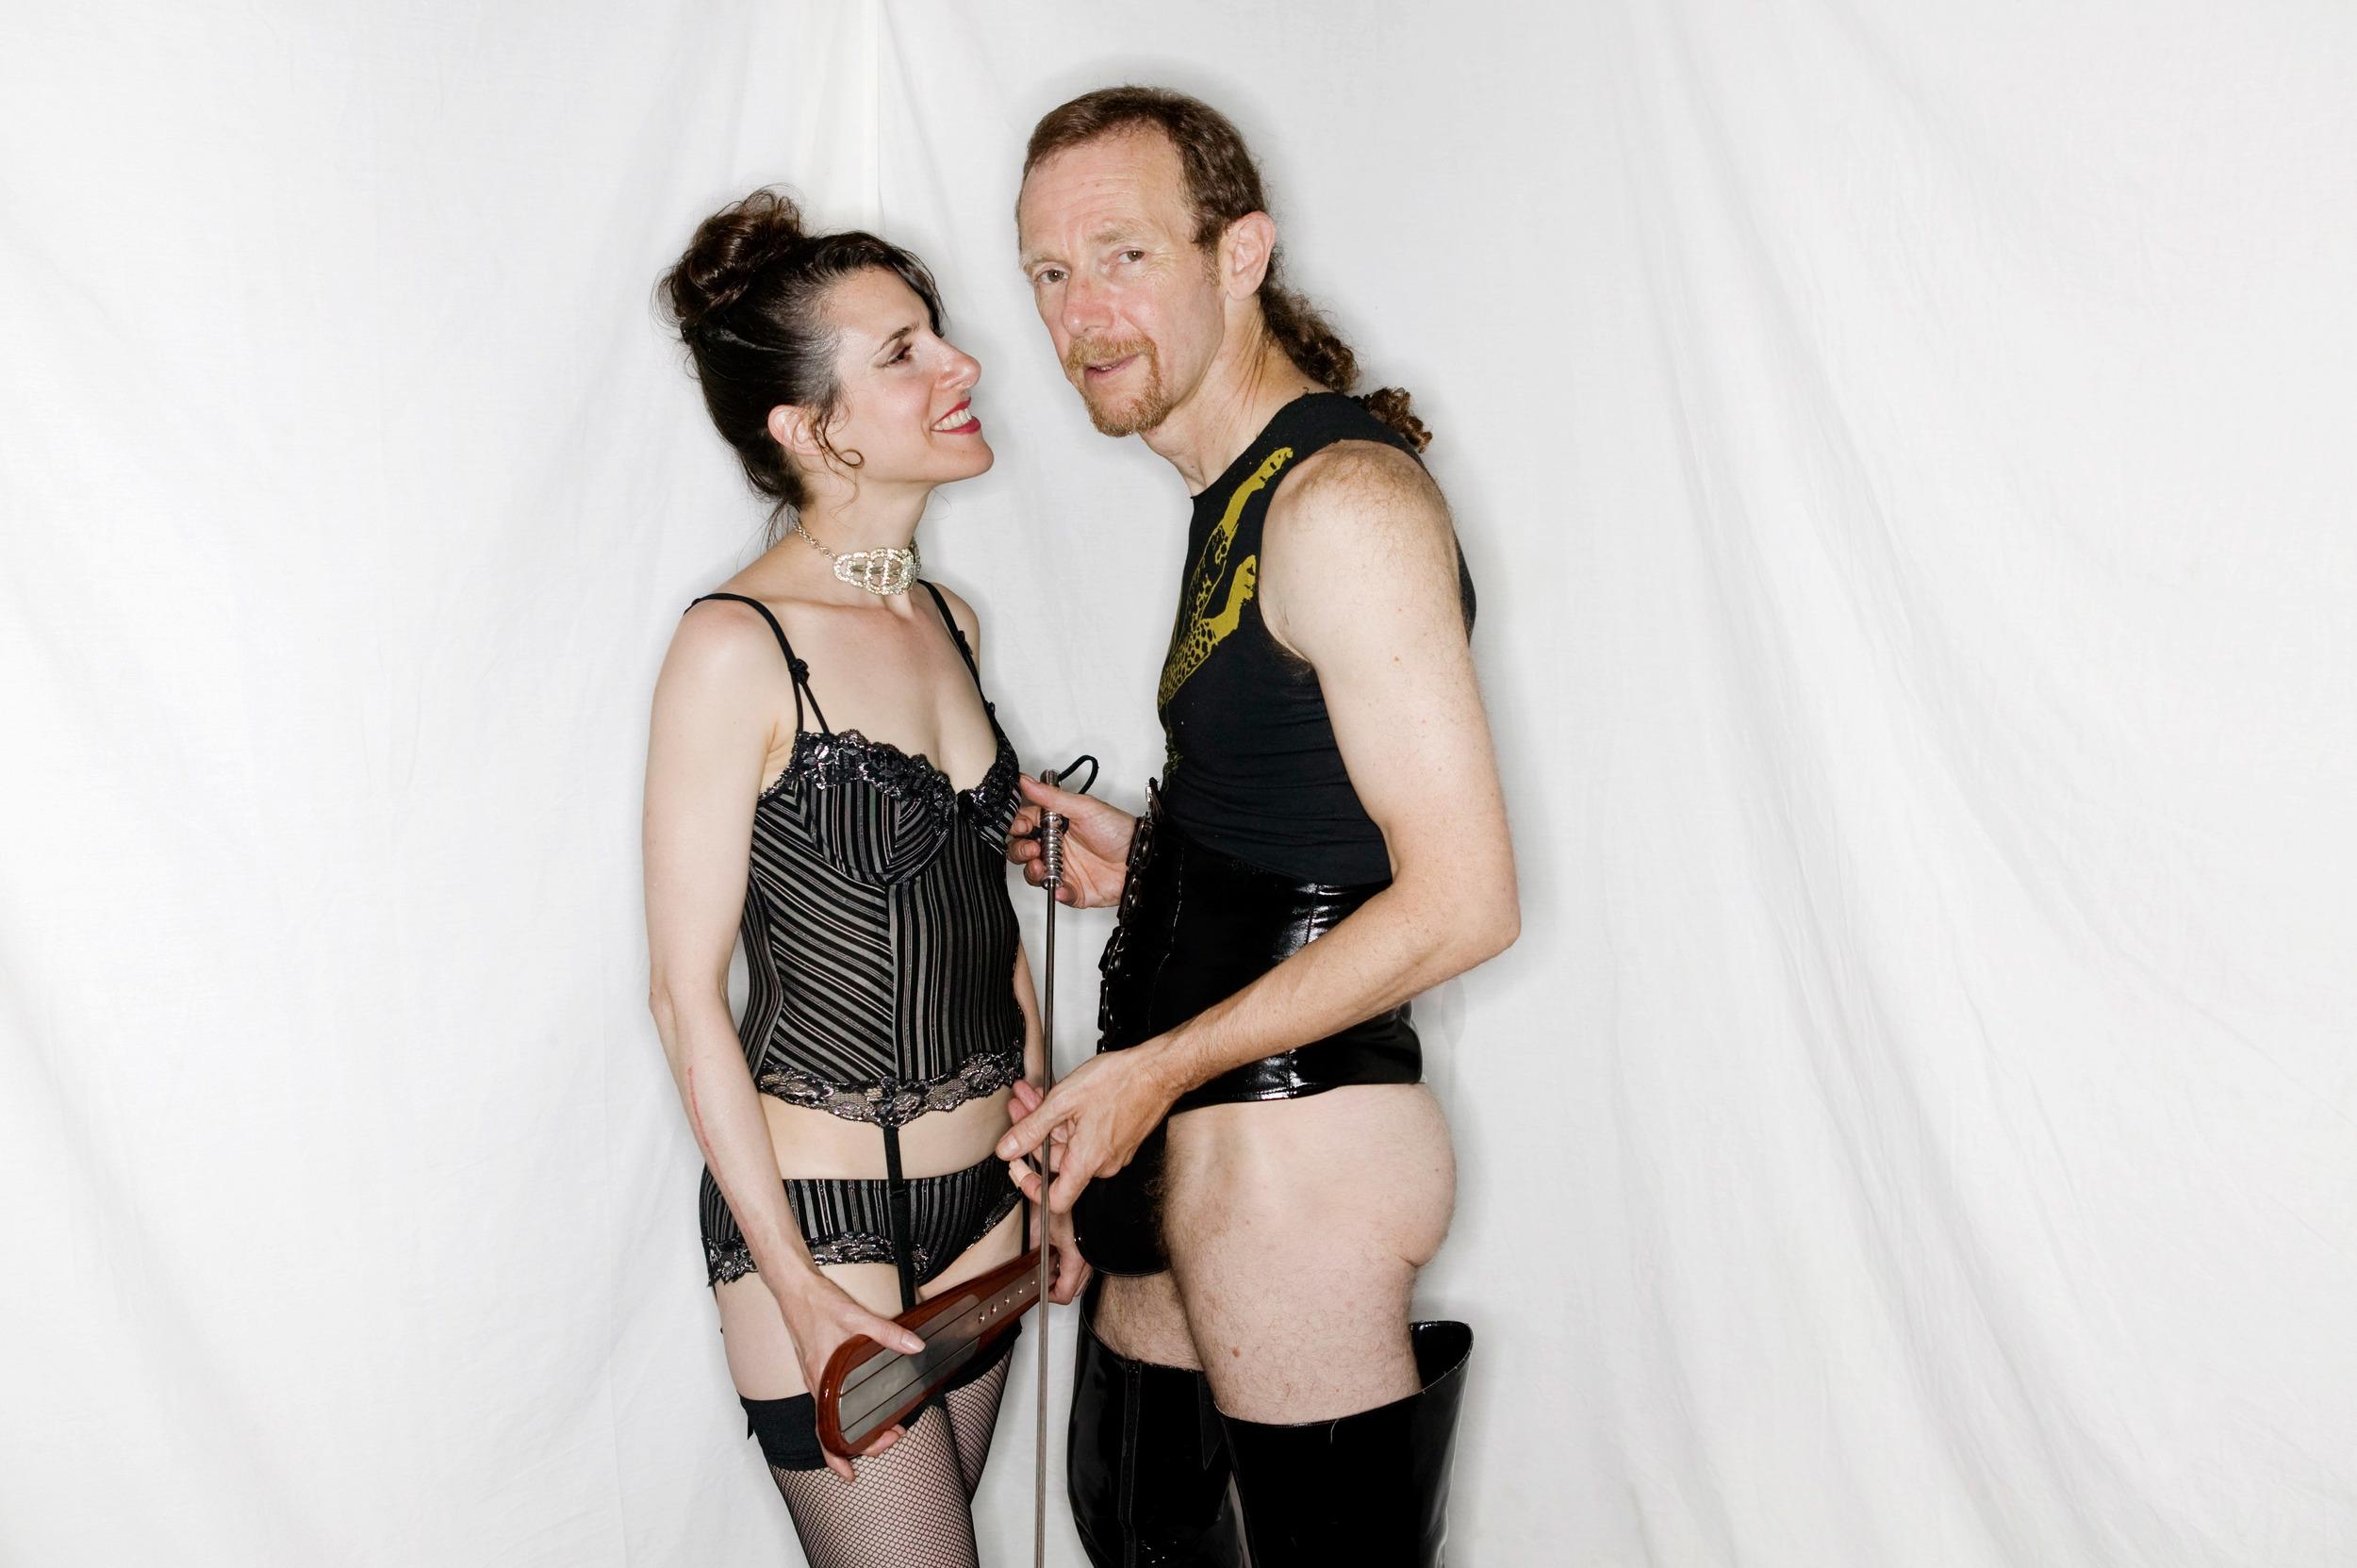 Mistress Collette & Master R